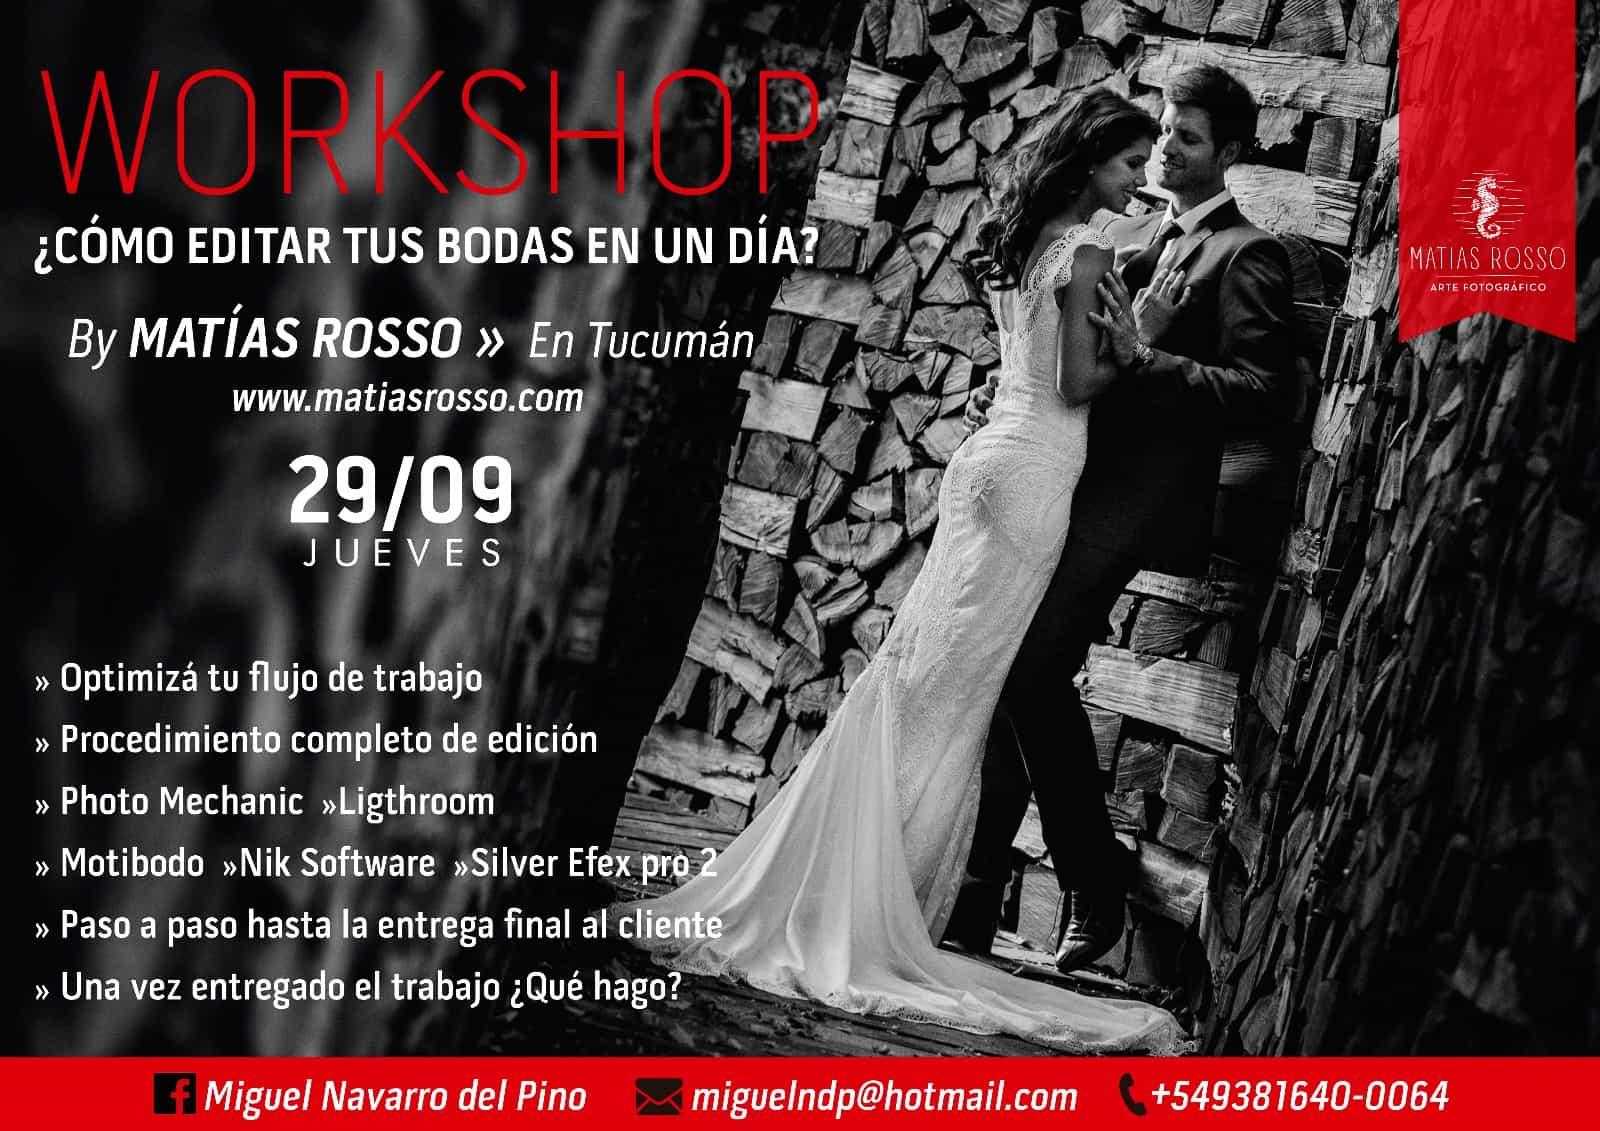 Nos Vamos a Tucumán – Fotógrafo de casamiento boda en Tucumán